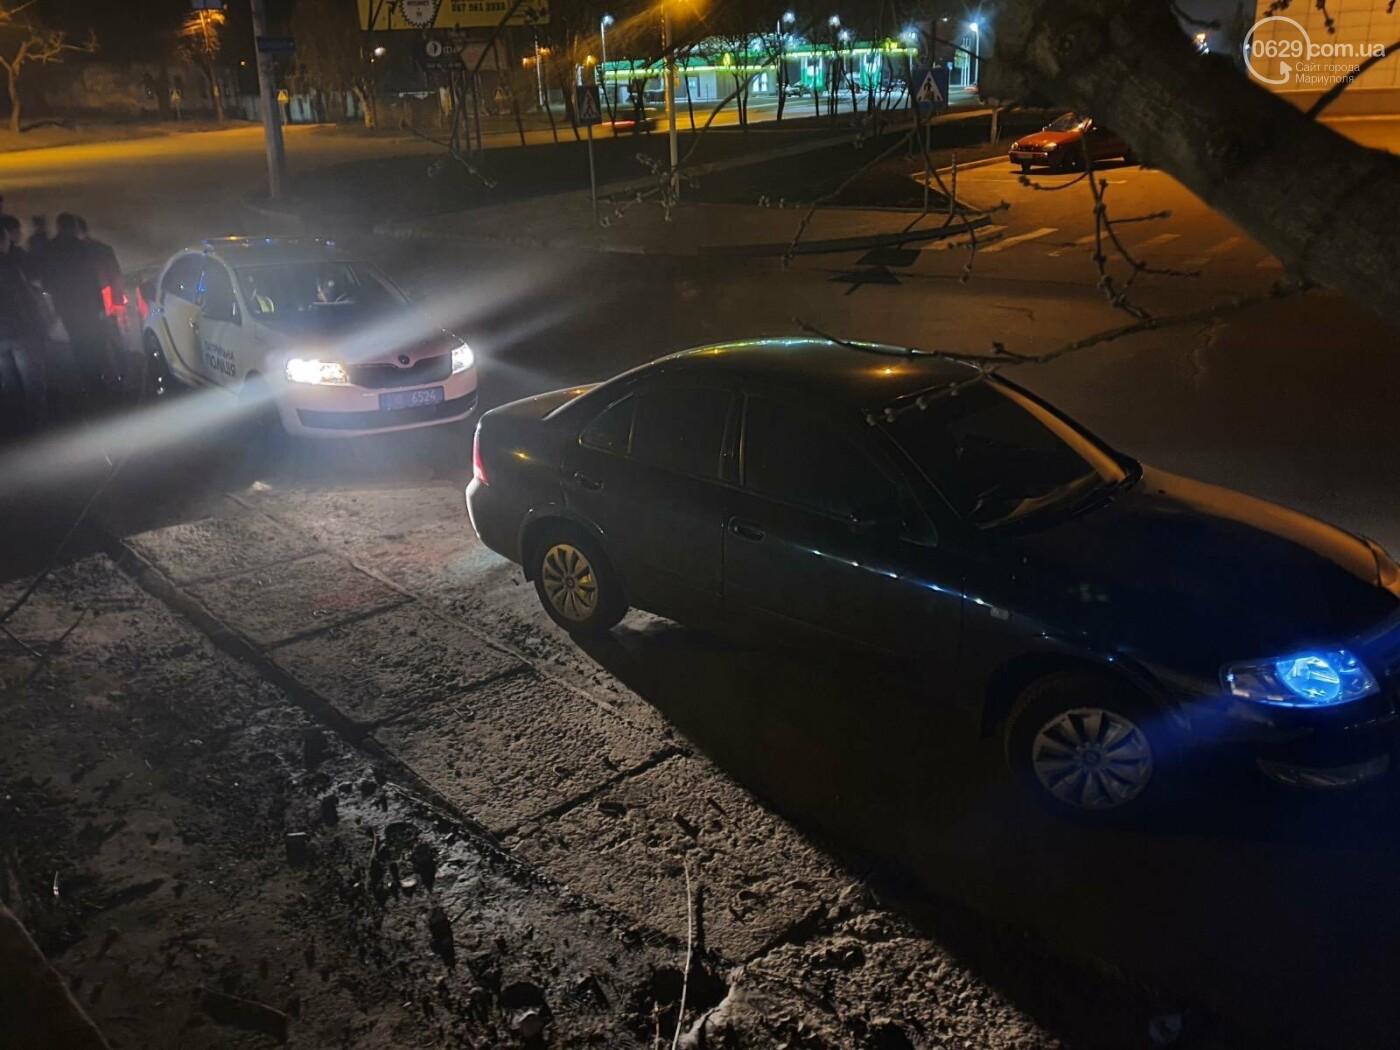 В Мариуполе Nissan сбил девушку на «зебре», - ФОТО, фото-1